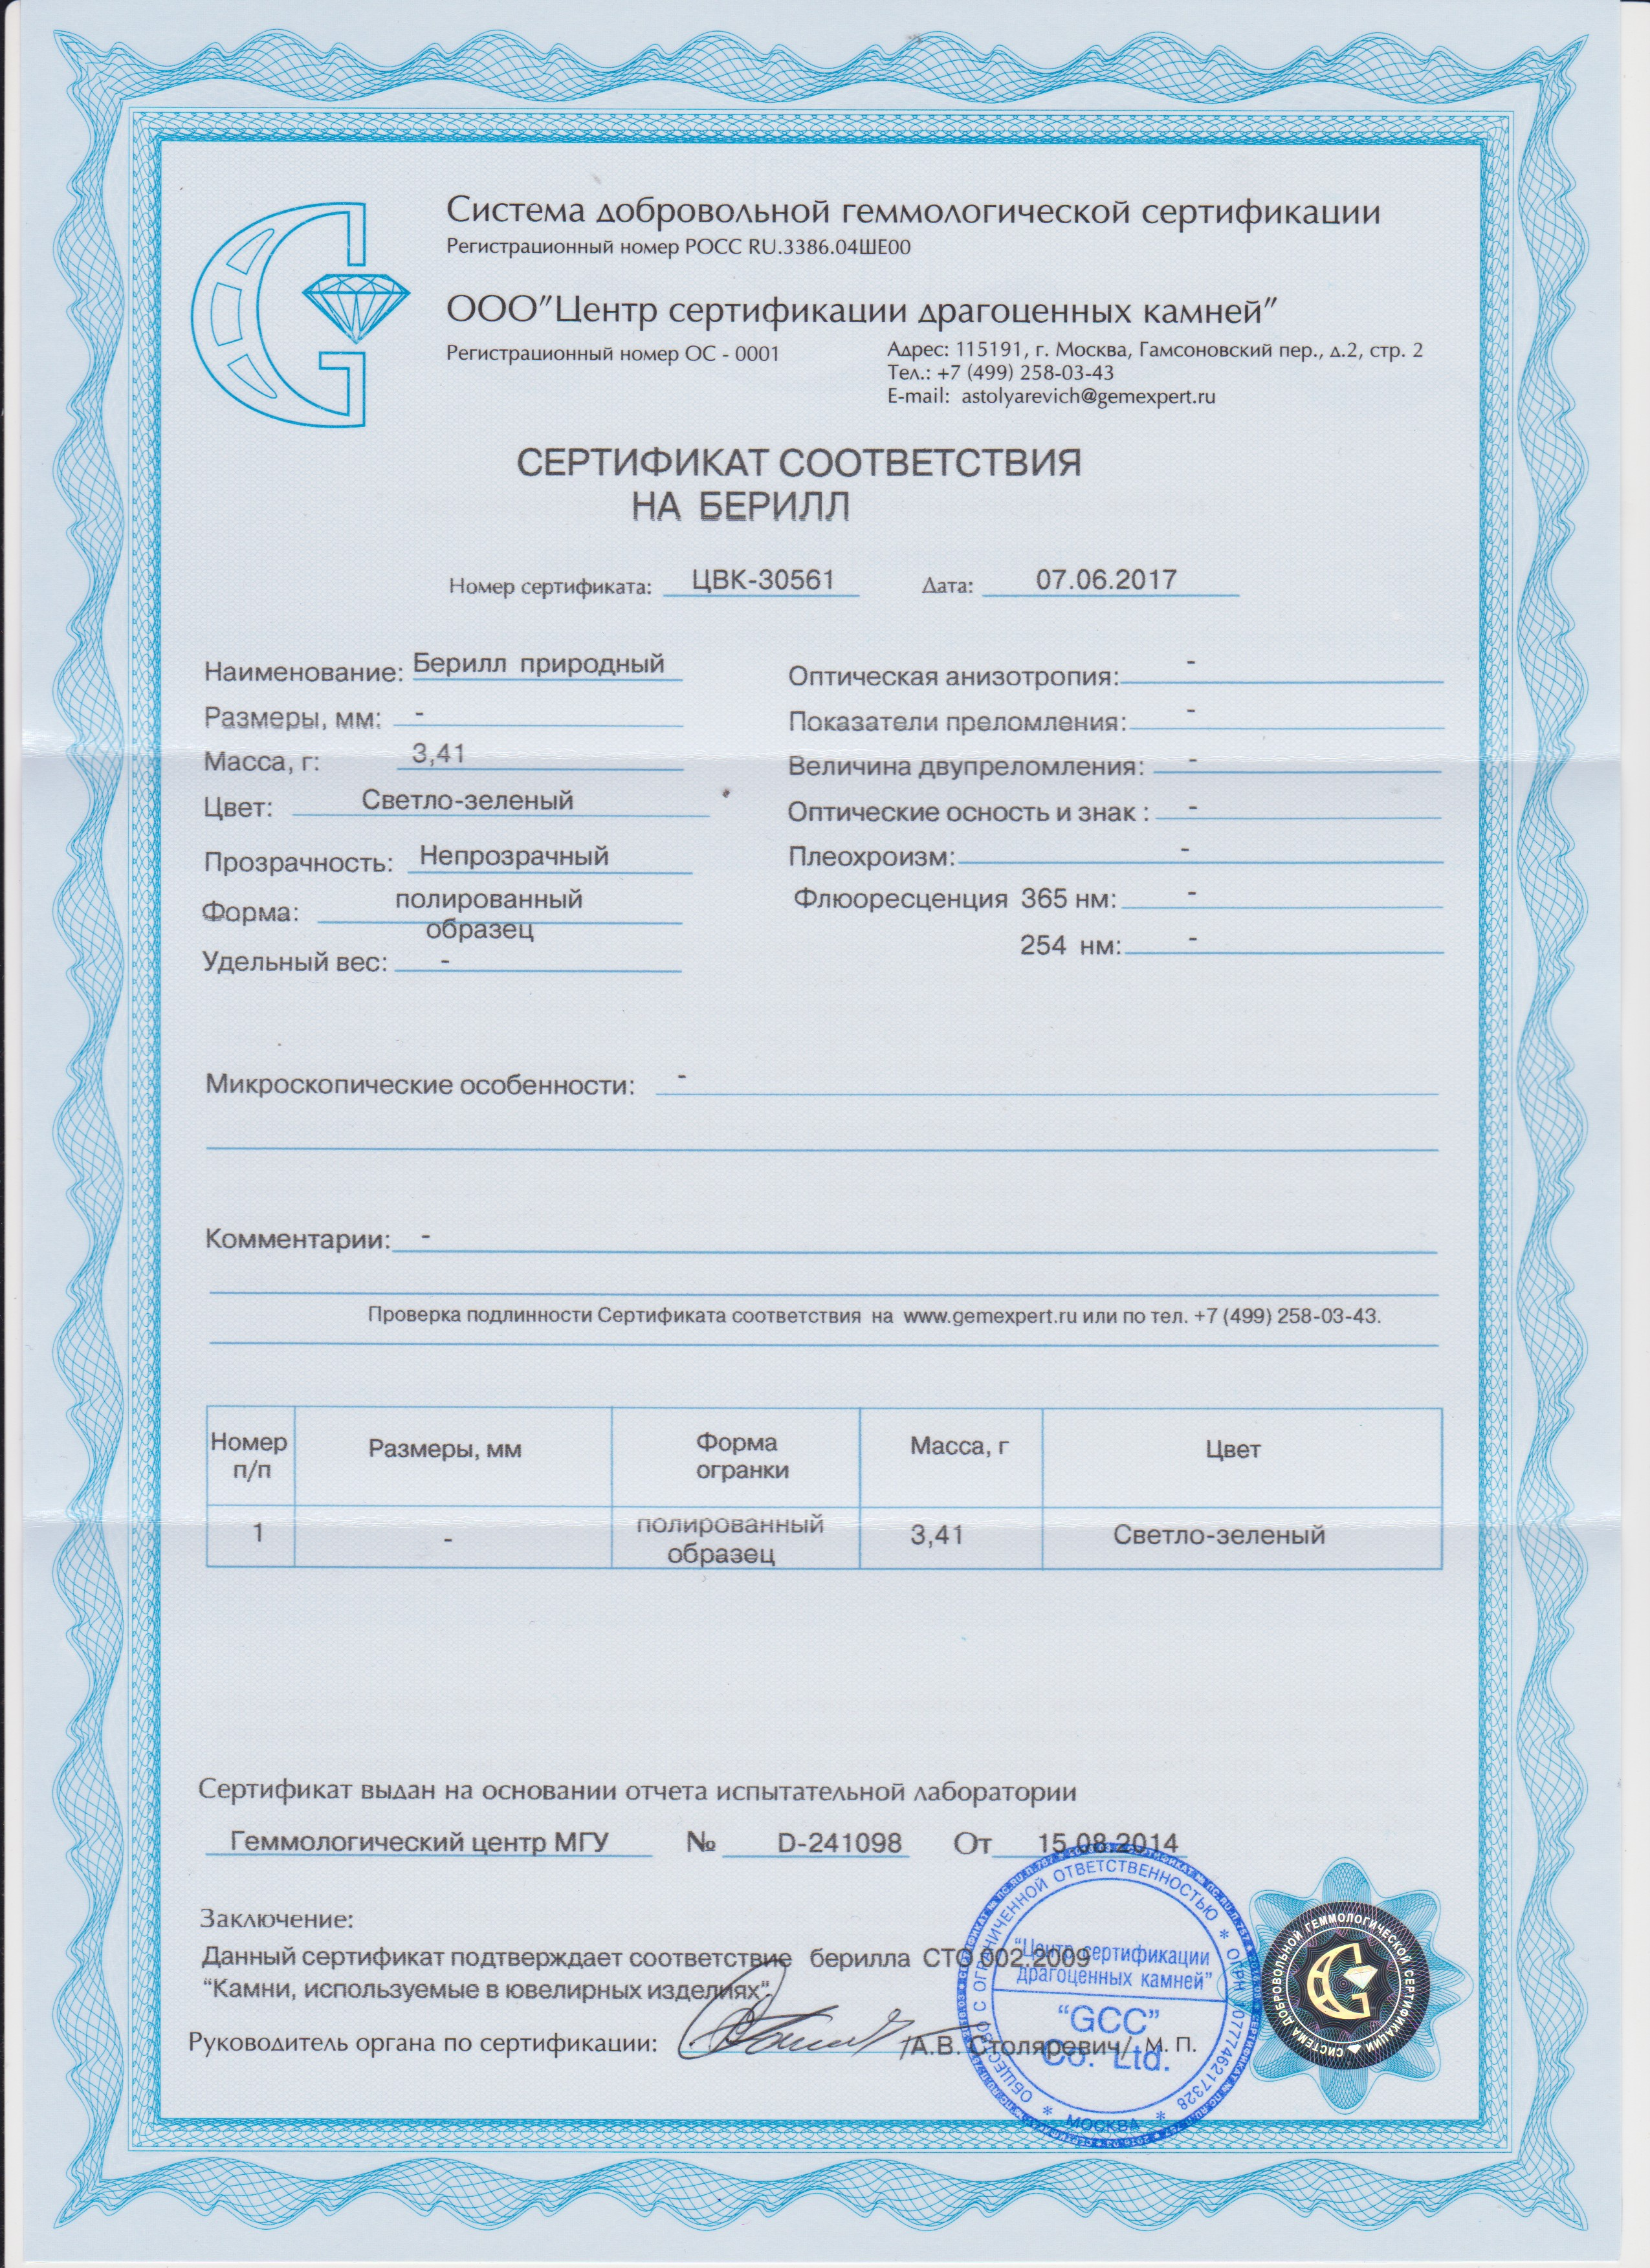 https://mineralmarket.ru/img/certificate/21/1497884135.jpg